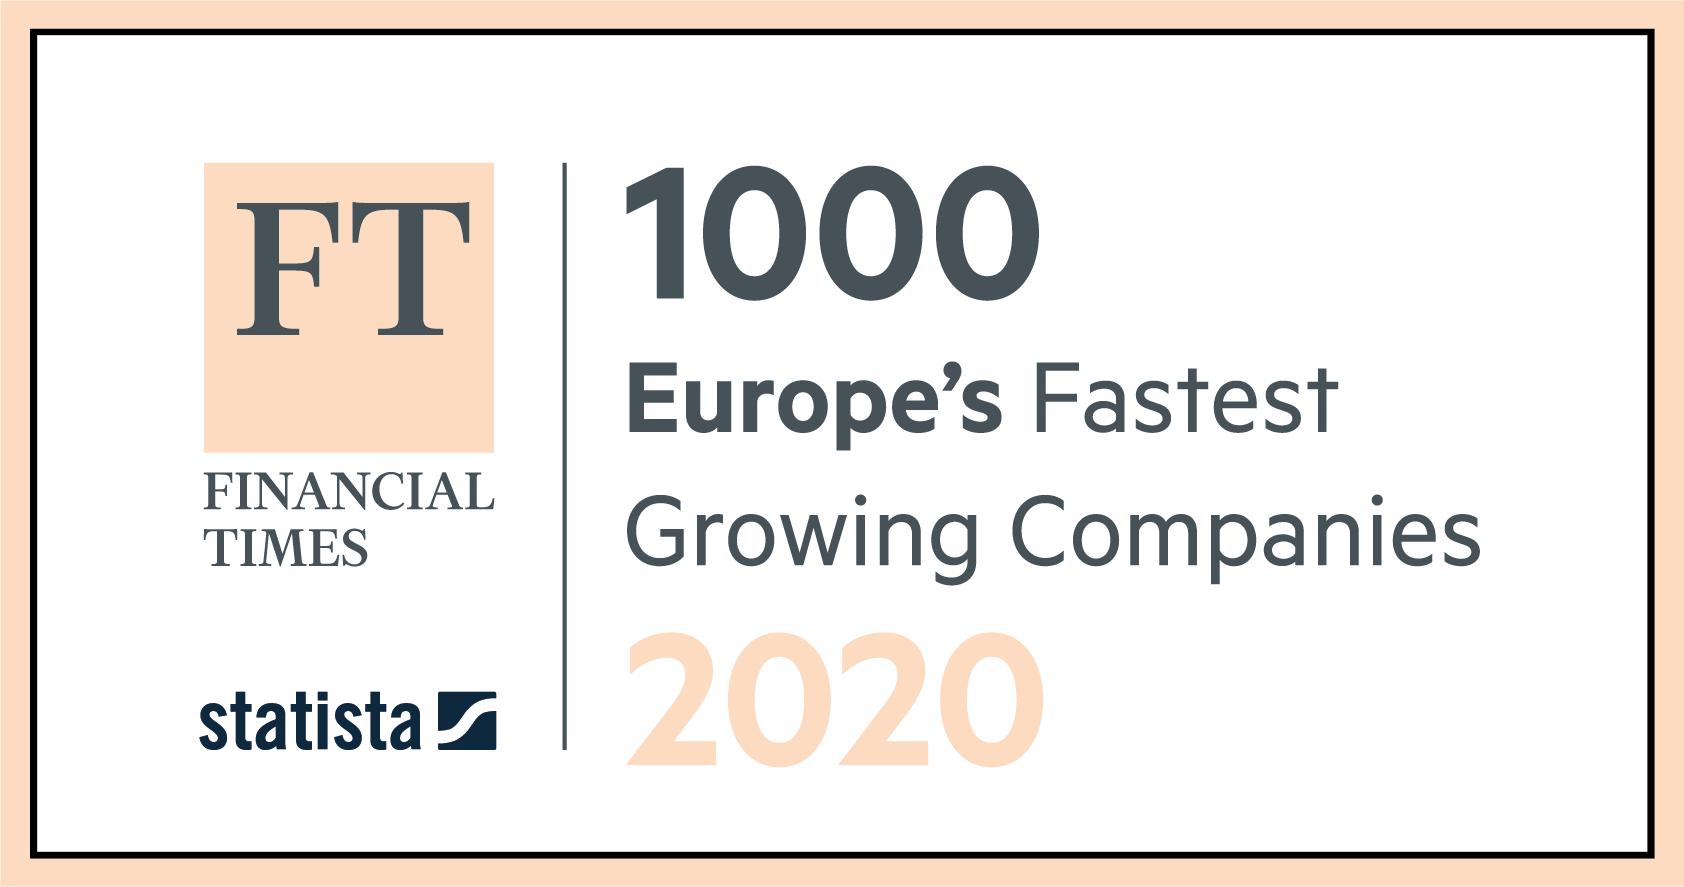 europe's fastest growing companies NIC